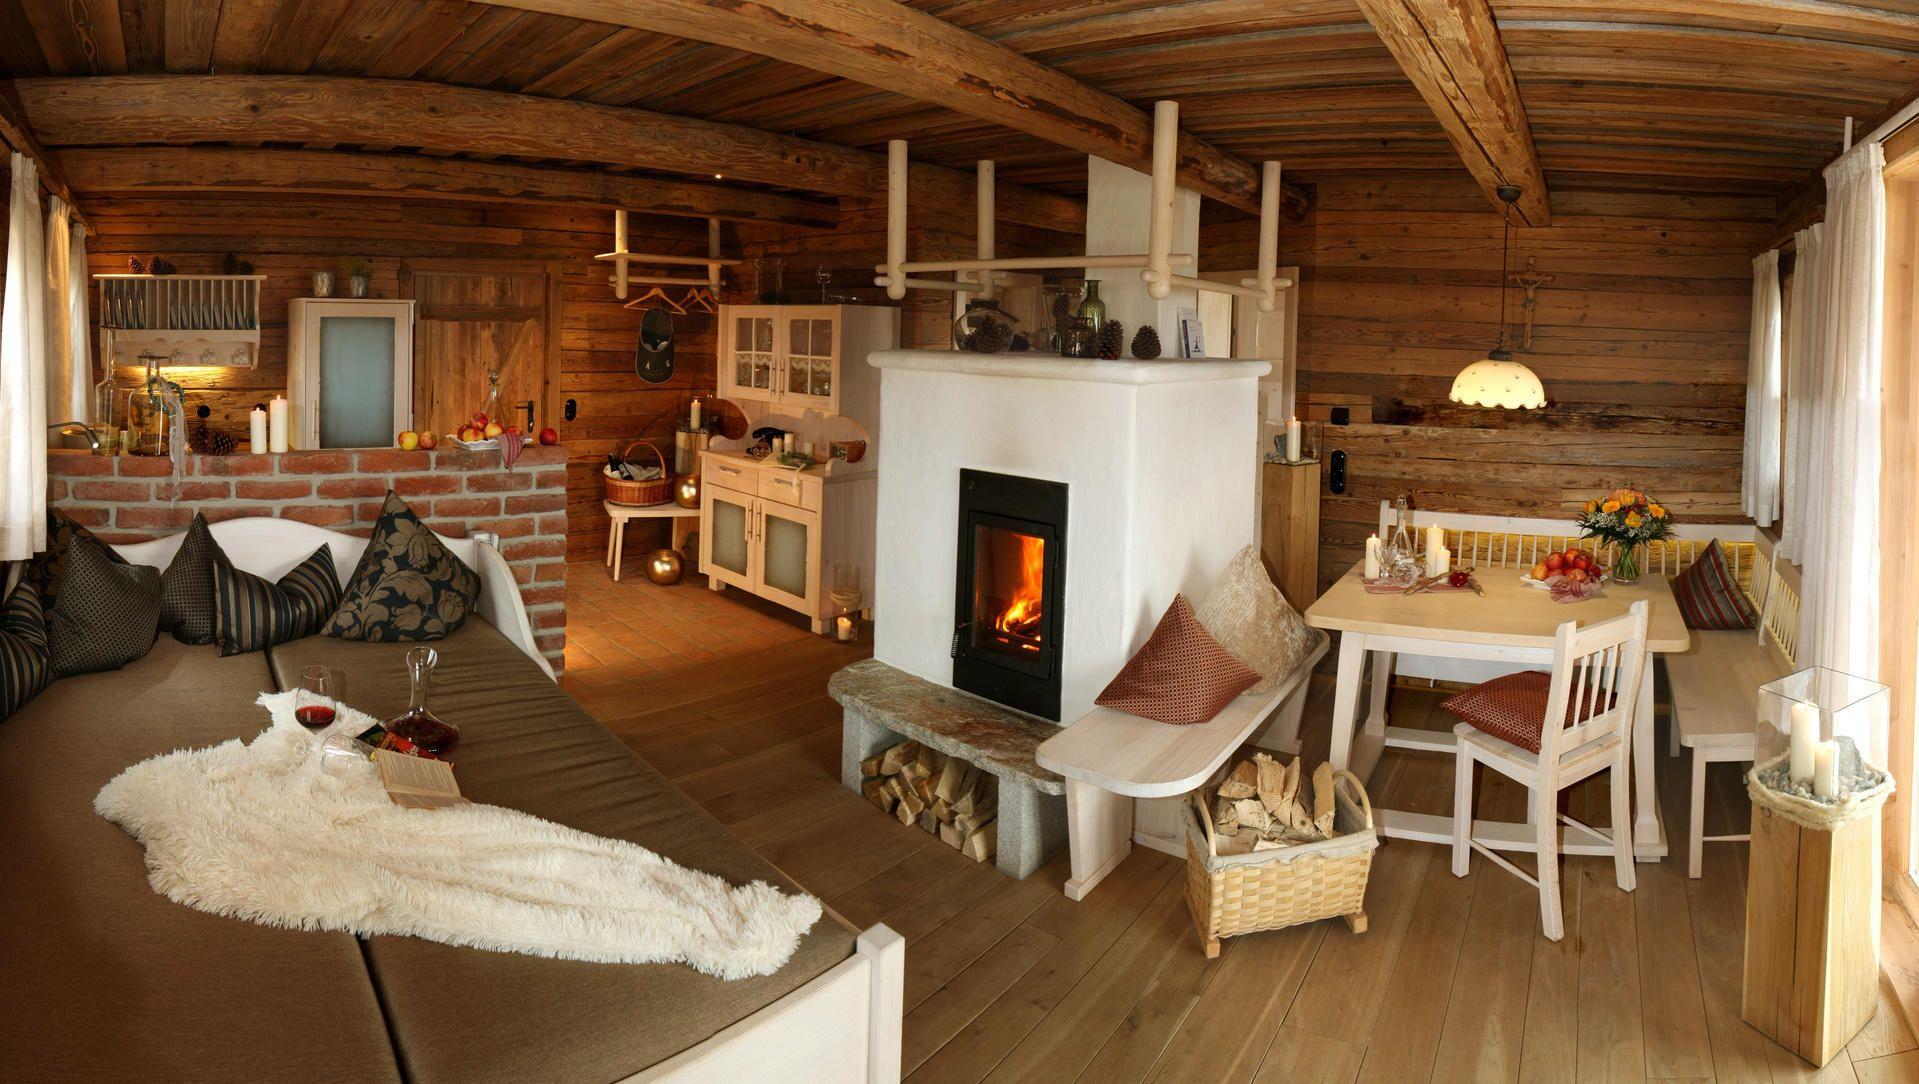 luxus bergh tte bayern im bay wald gartenhaus ideen einrichtung pinterest bergh tte luxus. Black Bedroom Furniture Sets. Home Design Ideas